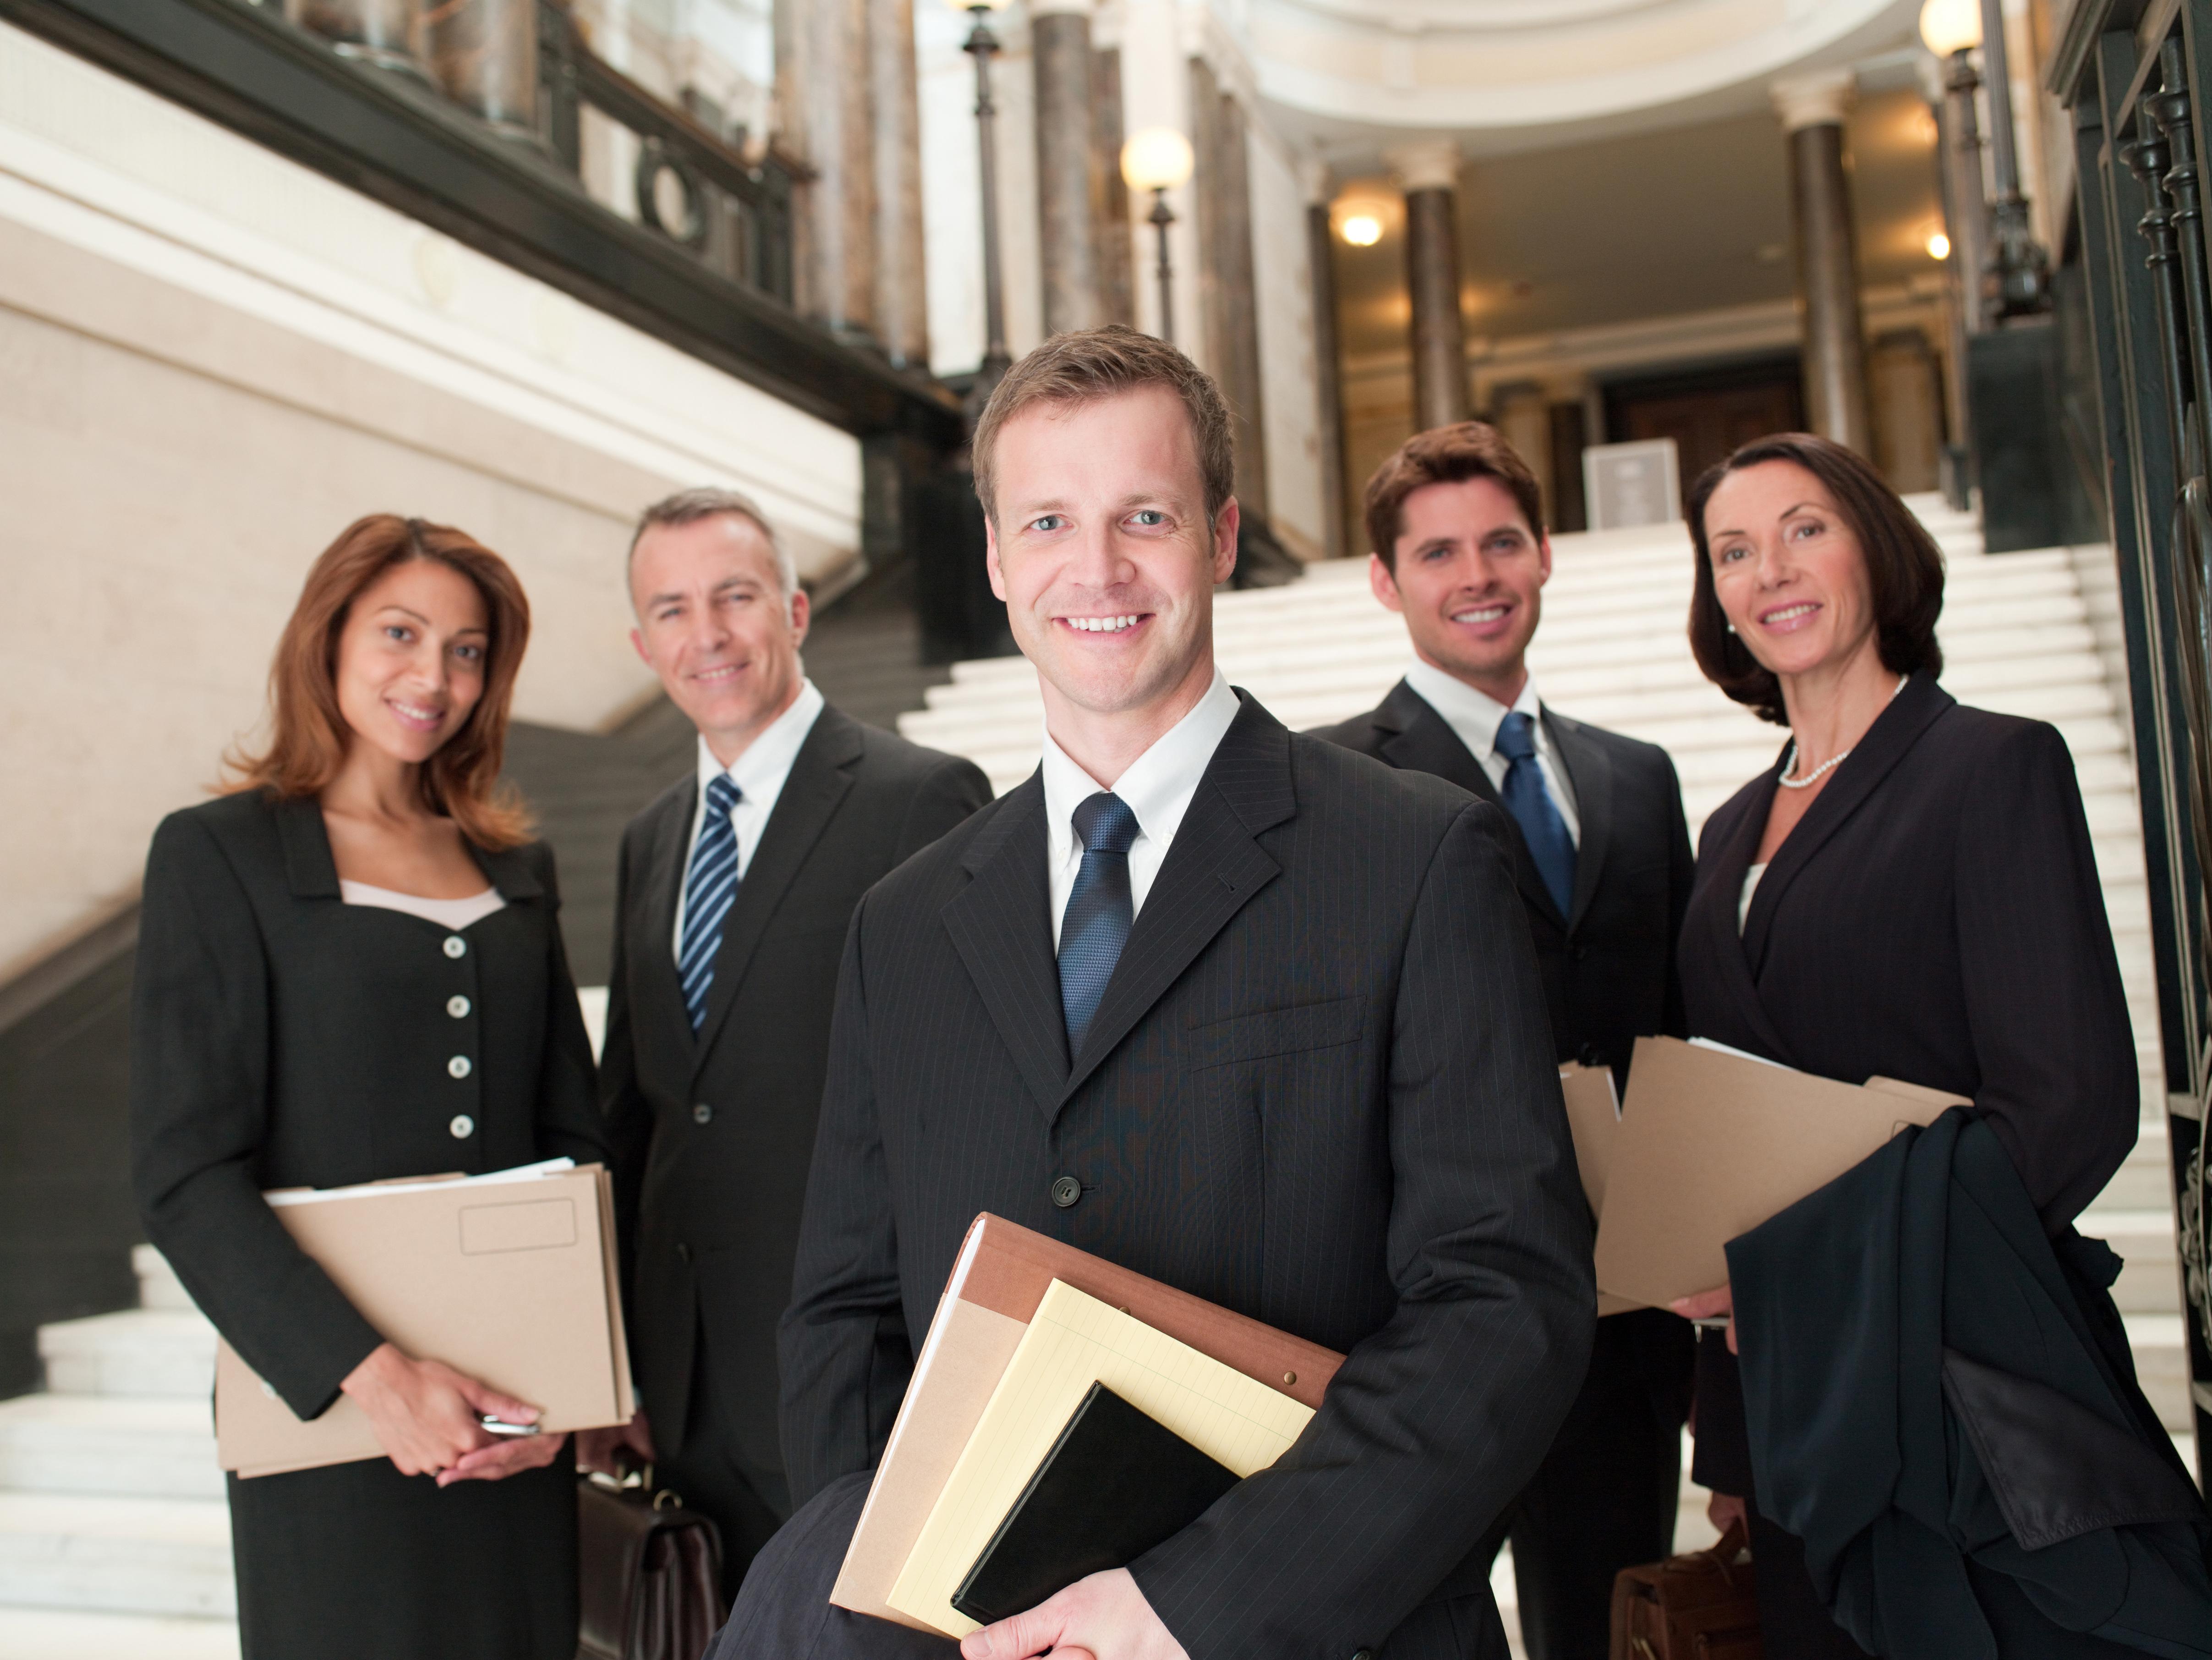 avvocati-nella-lobby